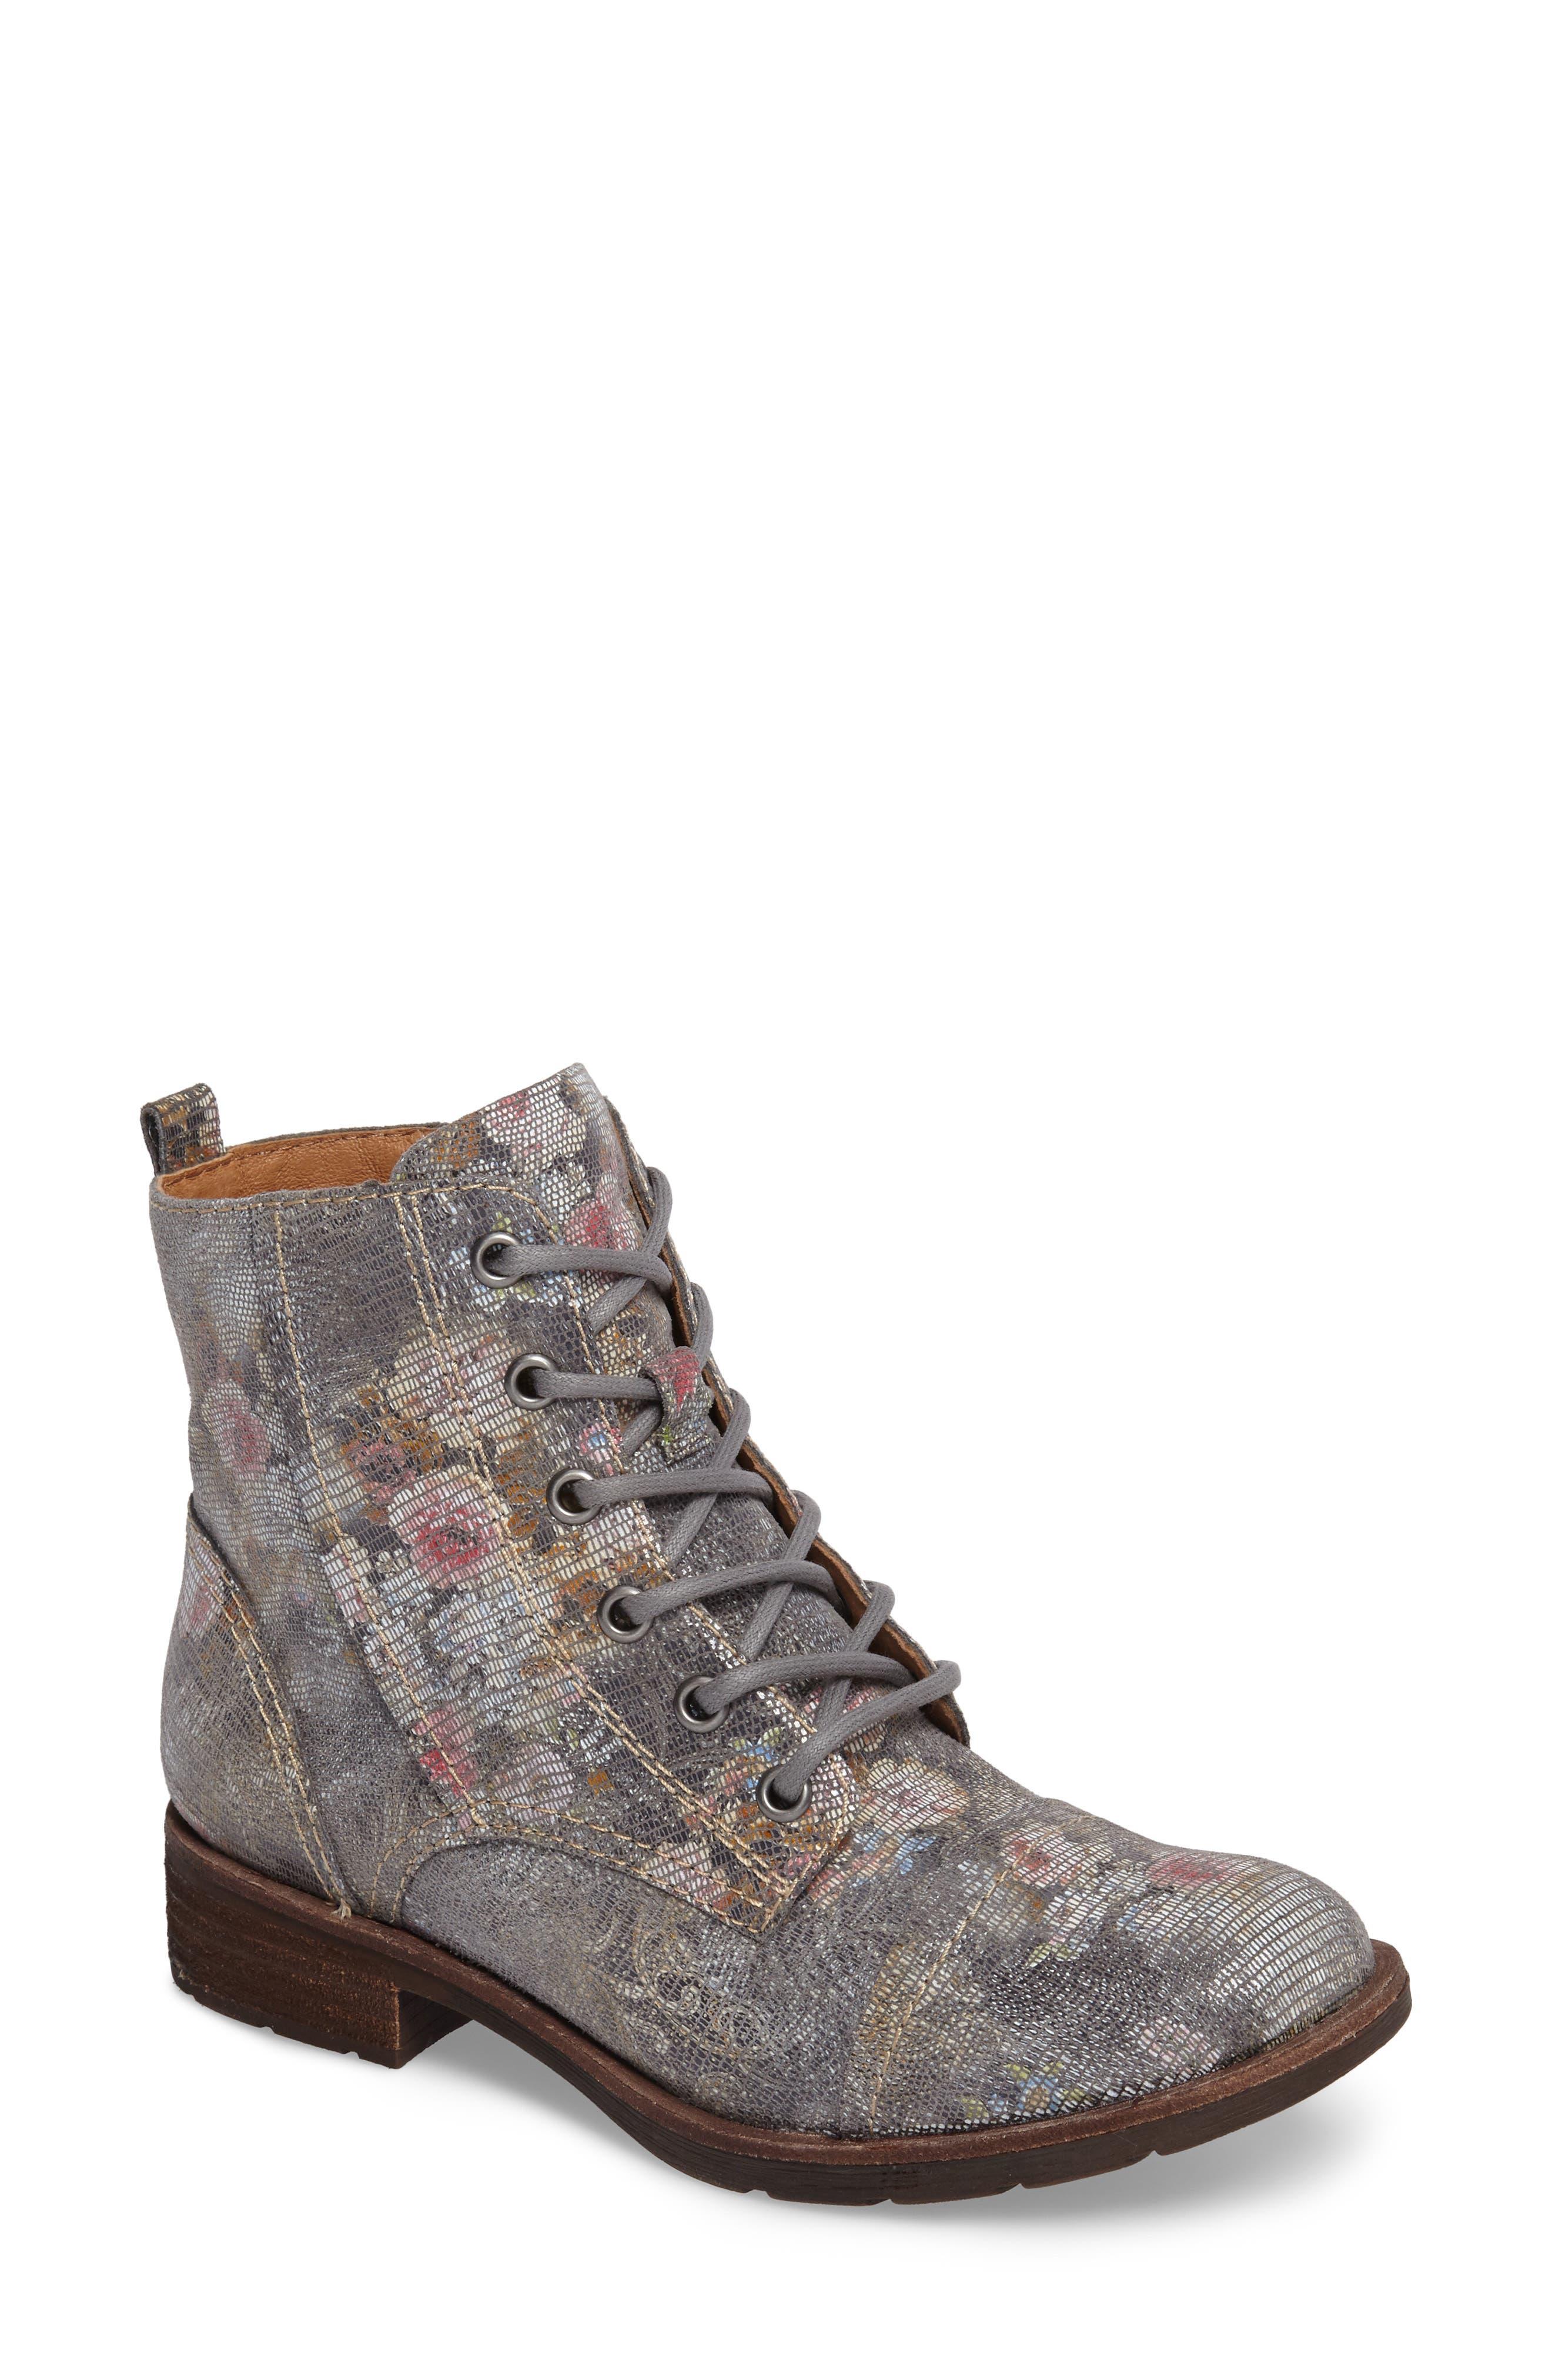 Sofft Belton Cap Toe Combat Boot, Grey